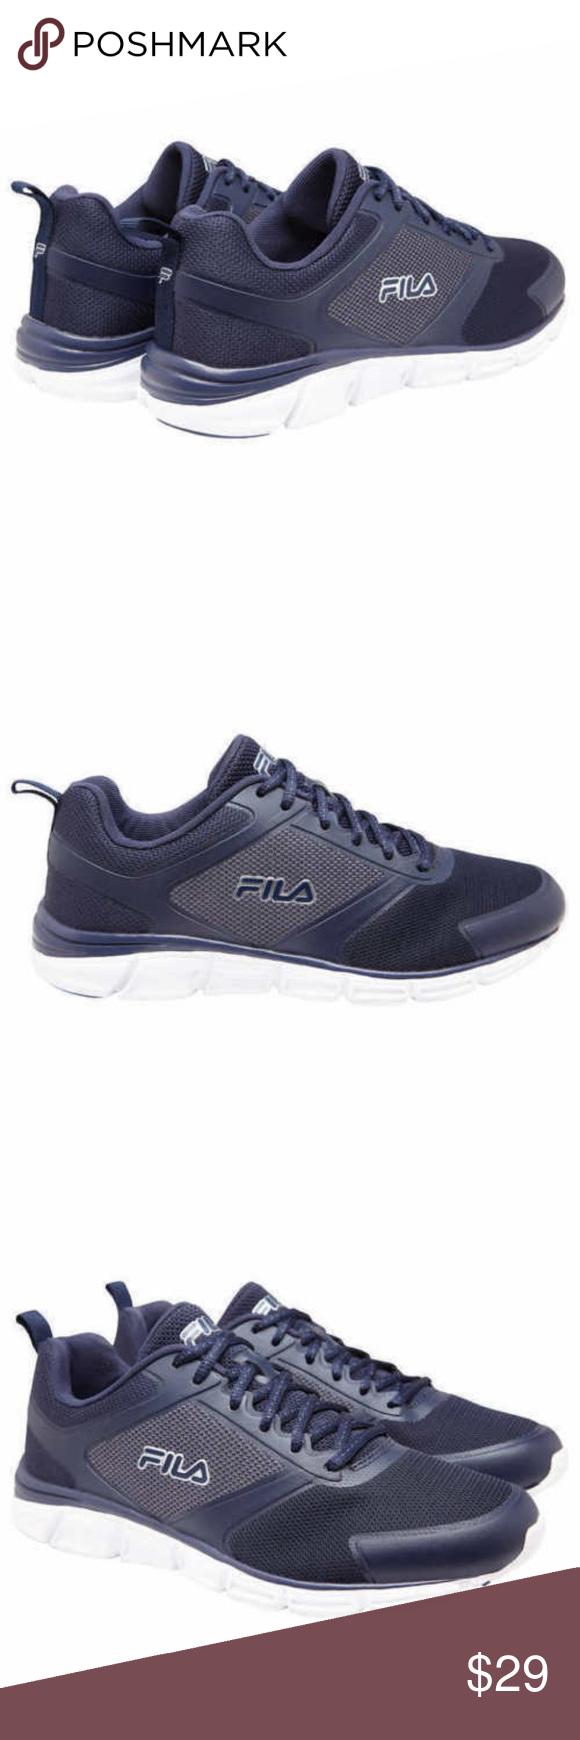 Fila Men's Memory Steelsprint Athletic Shoes Navy